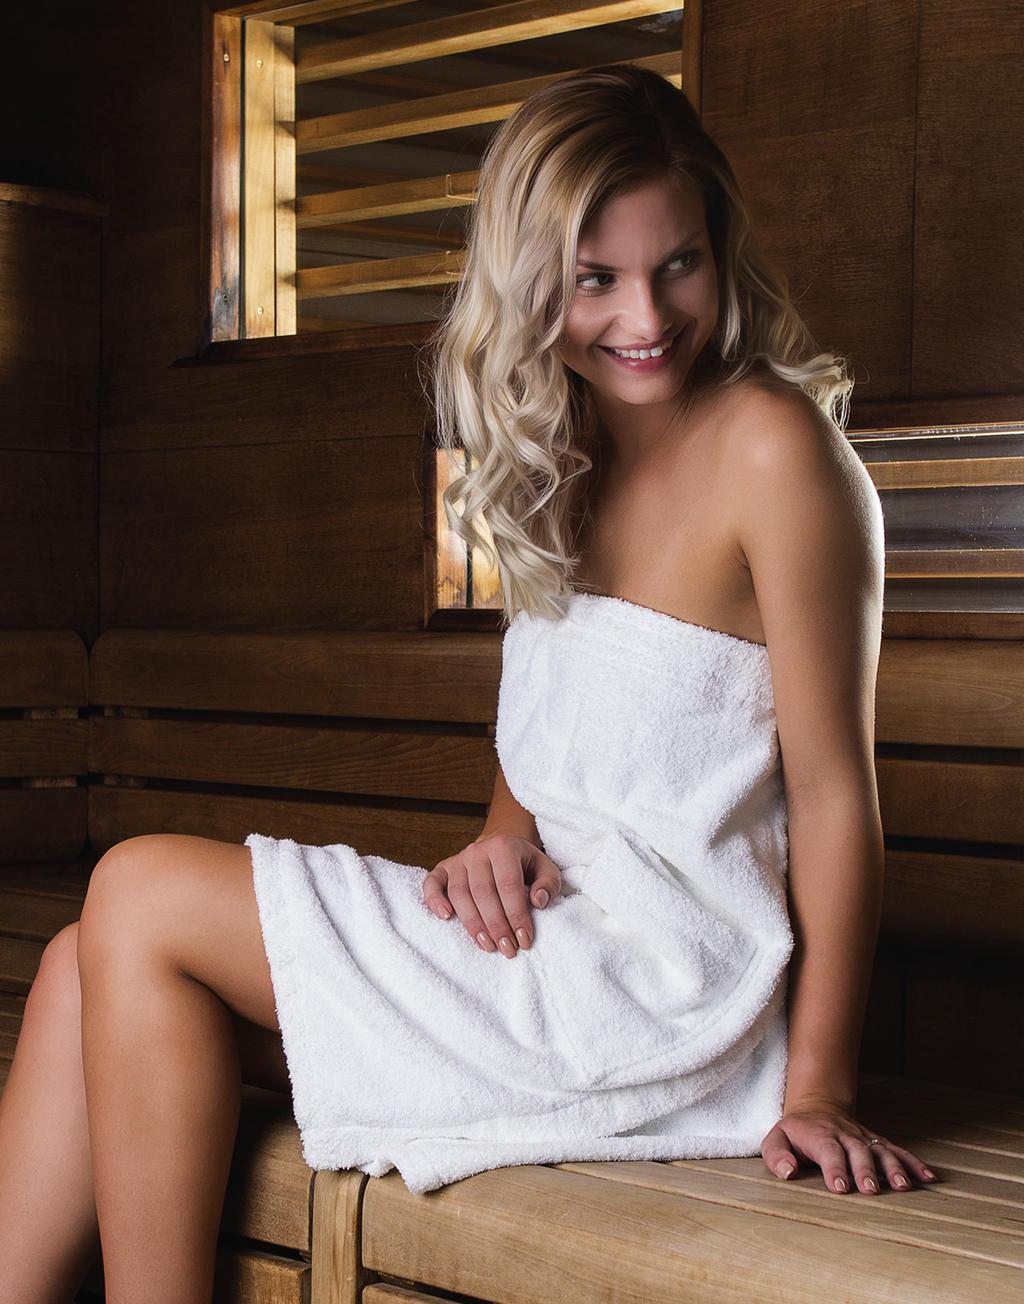 011_64_000_m-2017_01-Rh-ne-Sauna-Towel-towels-by-jassz